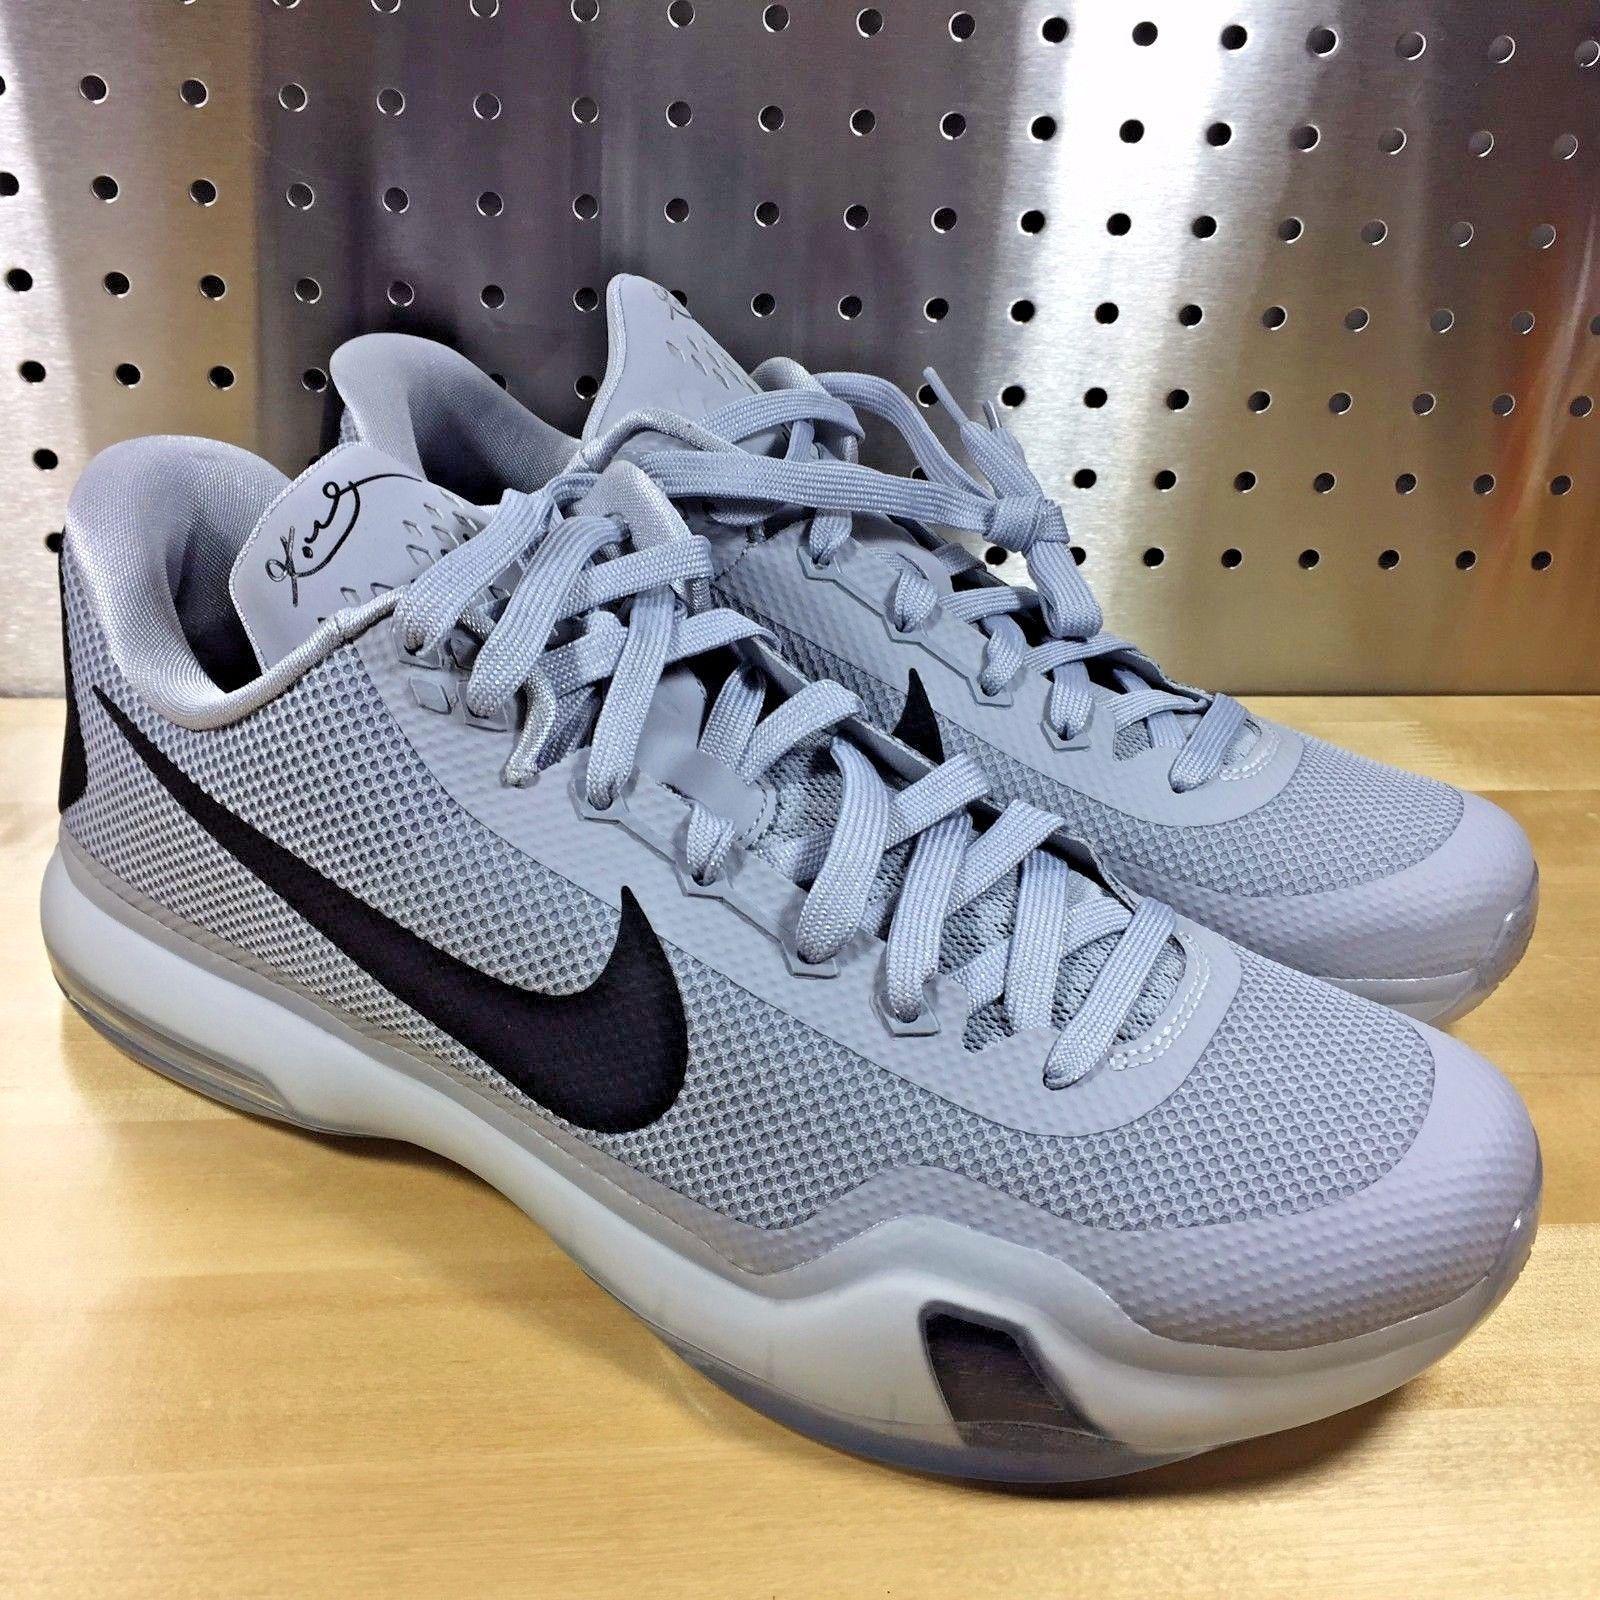 separation shoes 2abca f9cc1 reduced mens nike kobe x 10 tb elite basketball shoes 813030 011 size 12  grey 13294